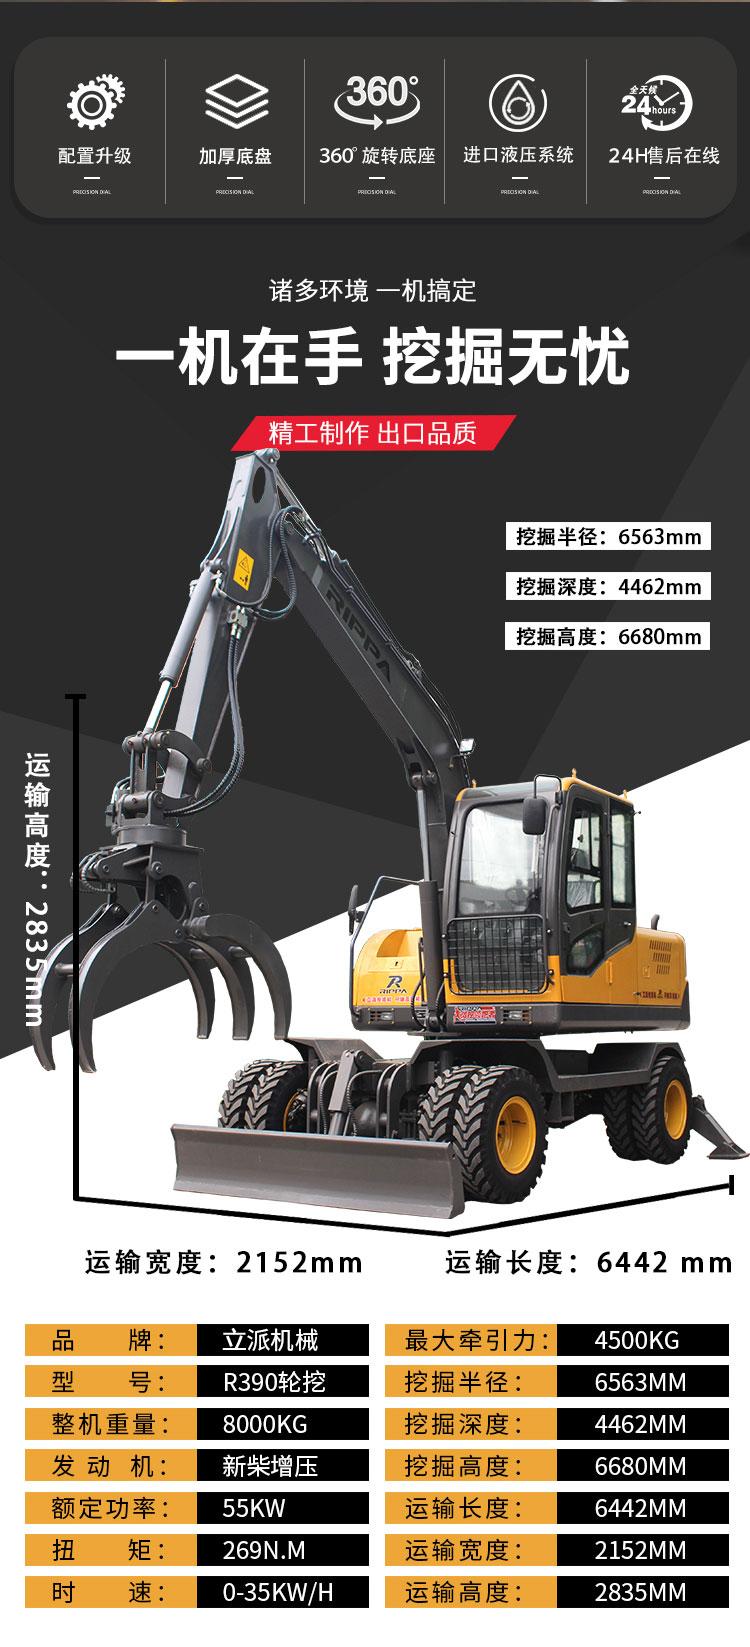 R390轮式小型挖掘机